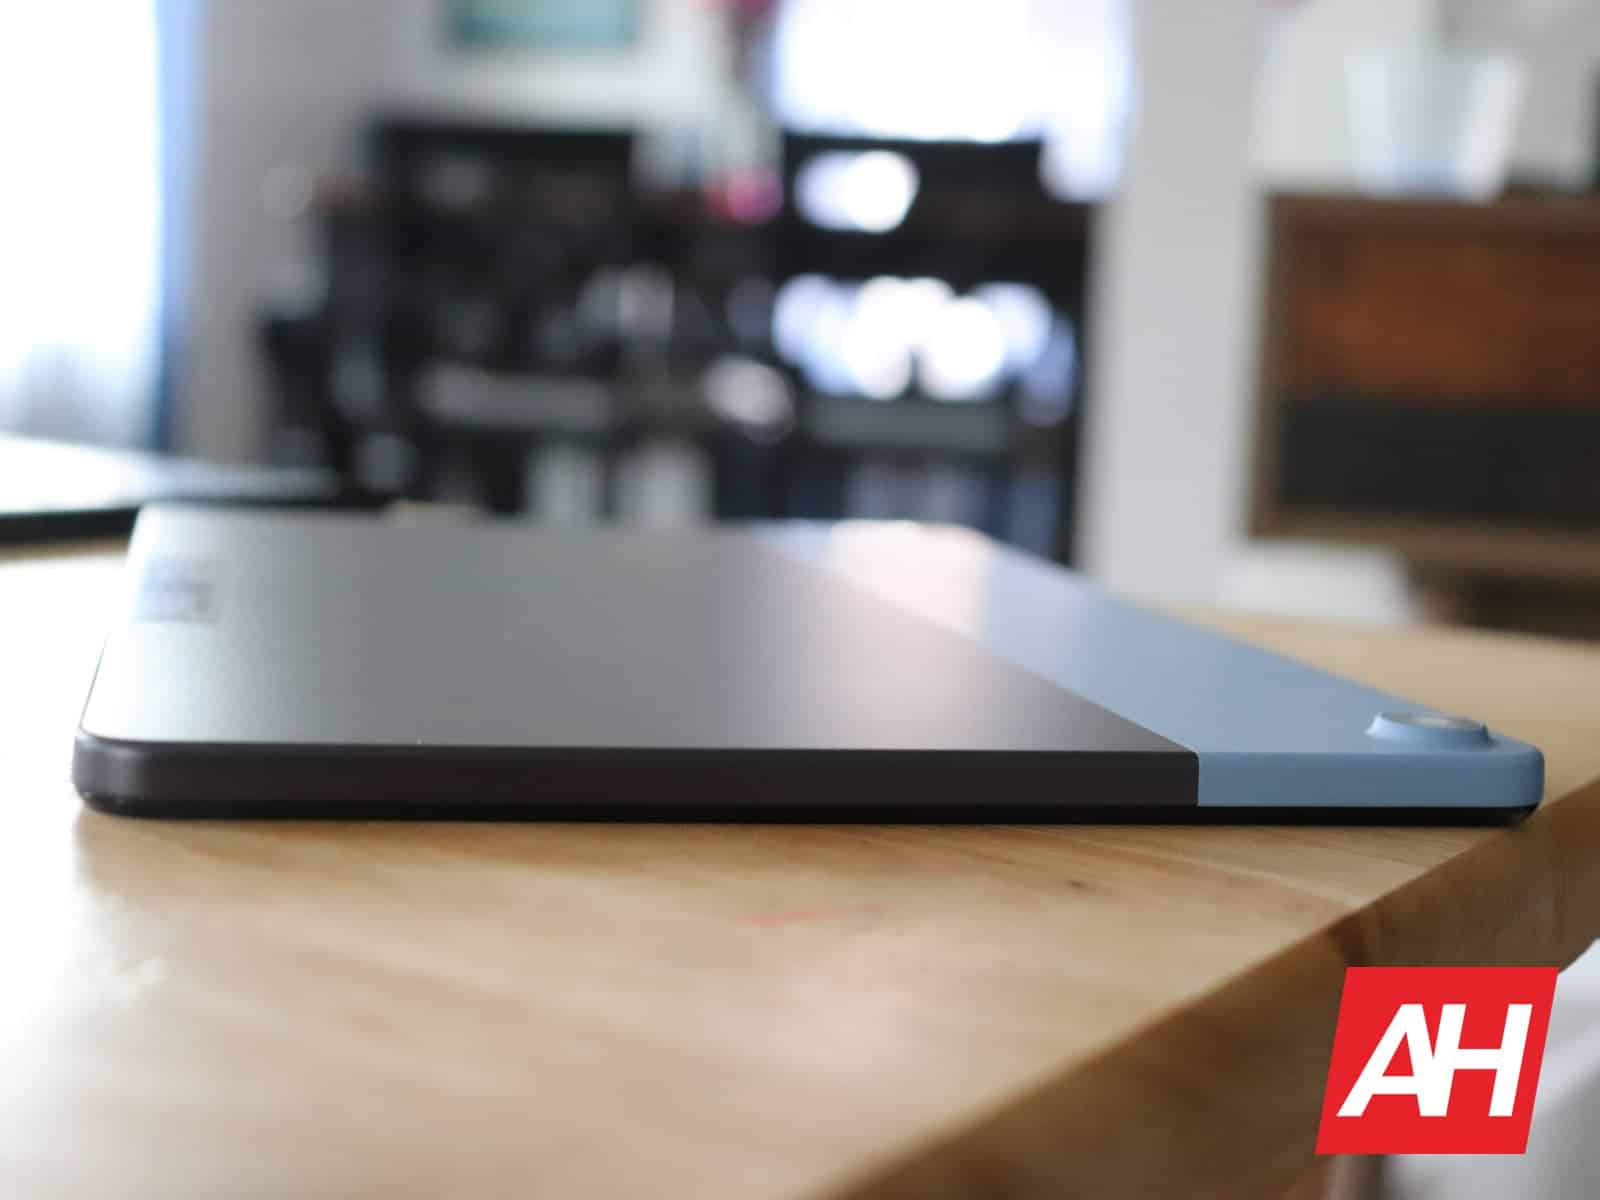 02 2 Lenovo IdeaPad Duet Hardware AH 2020